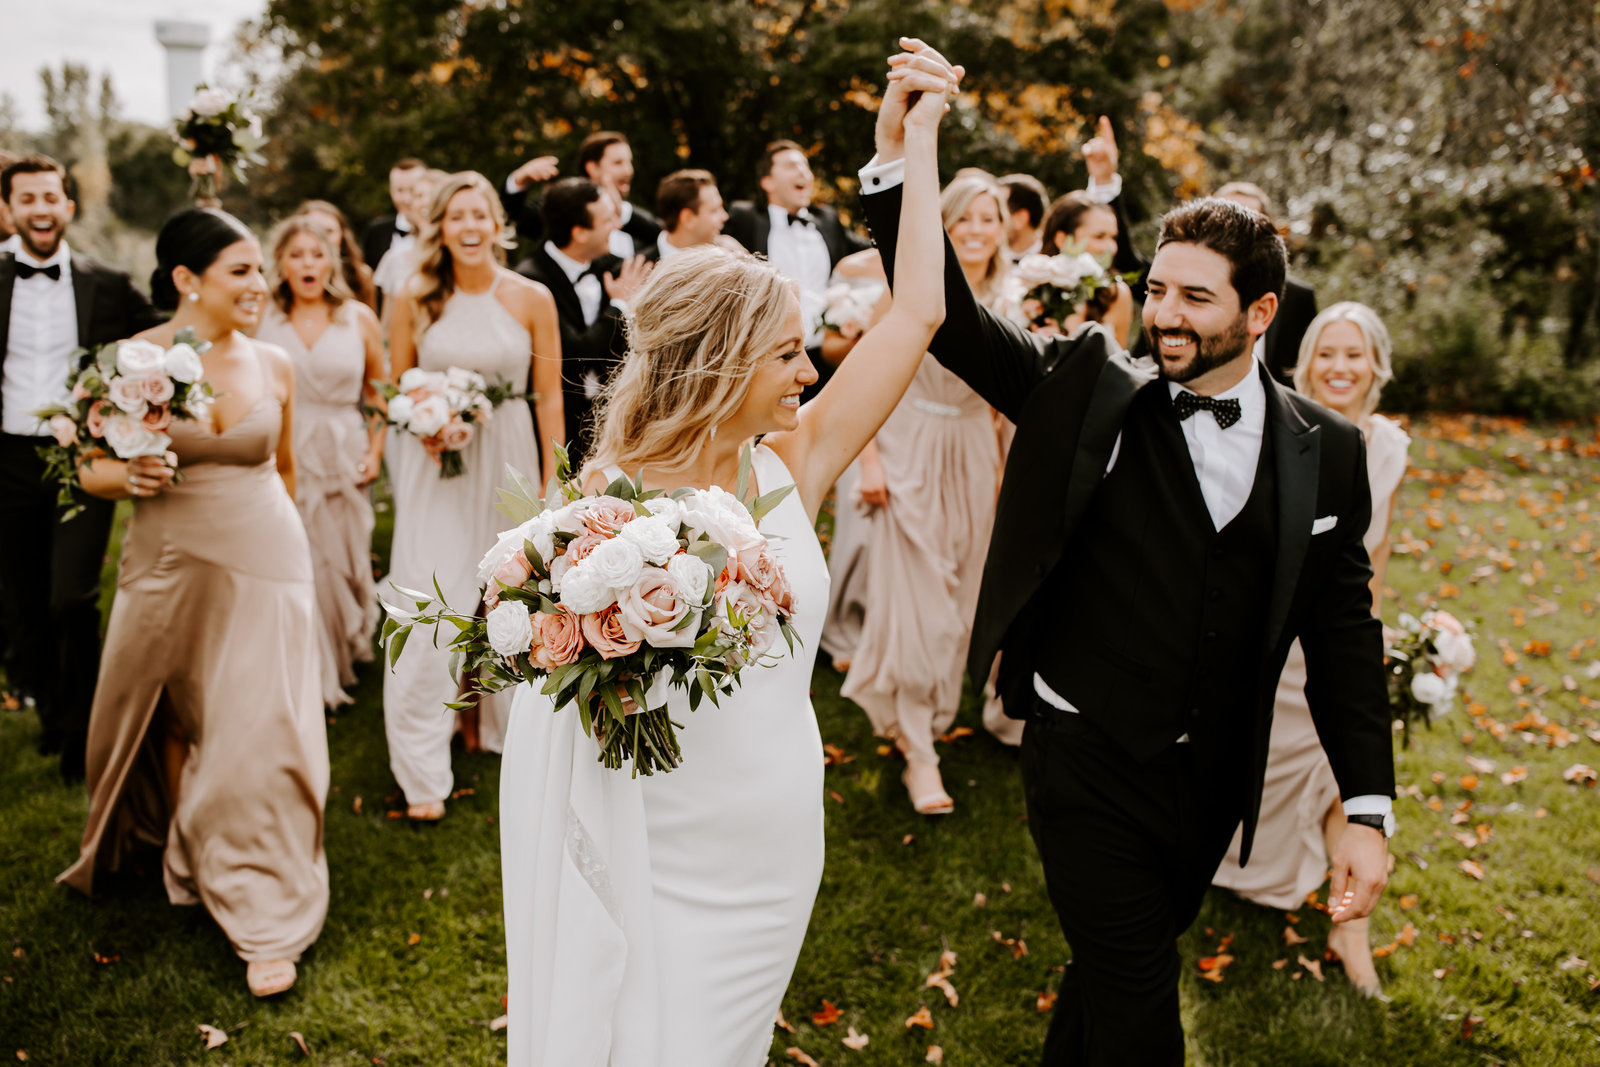 Bruidspaar met gasten